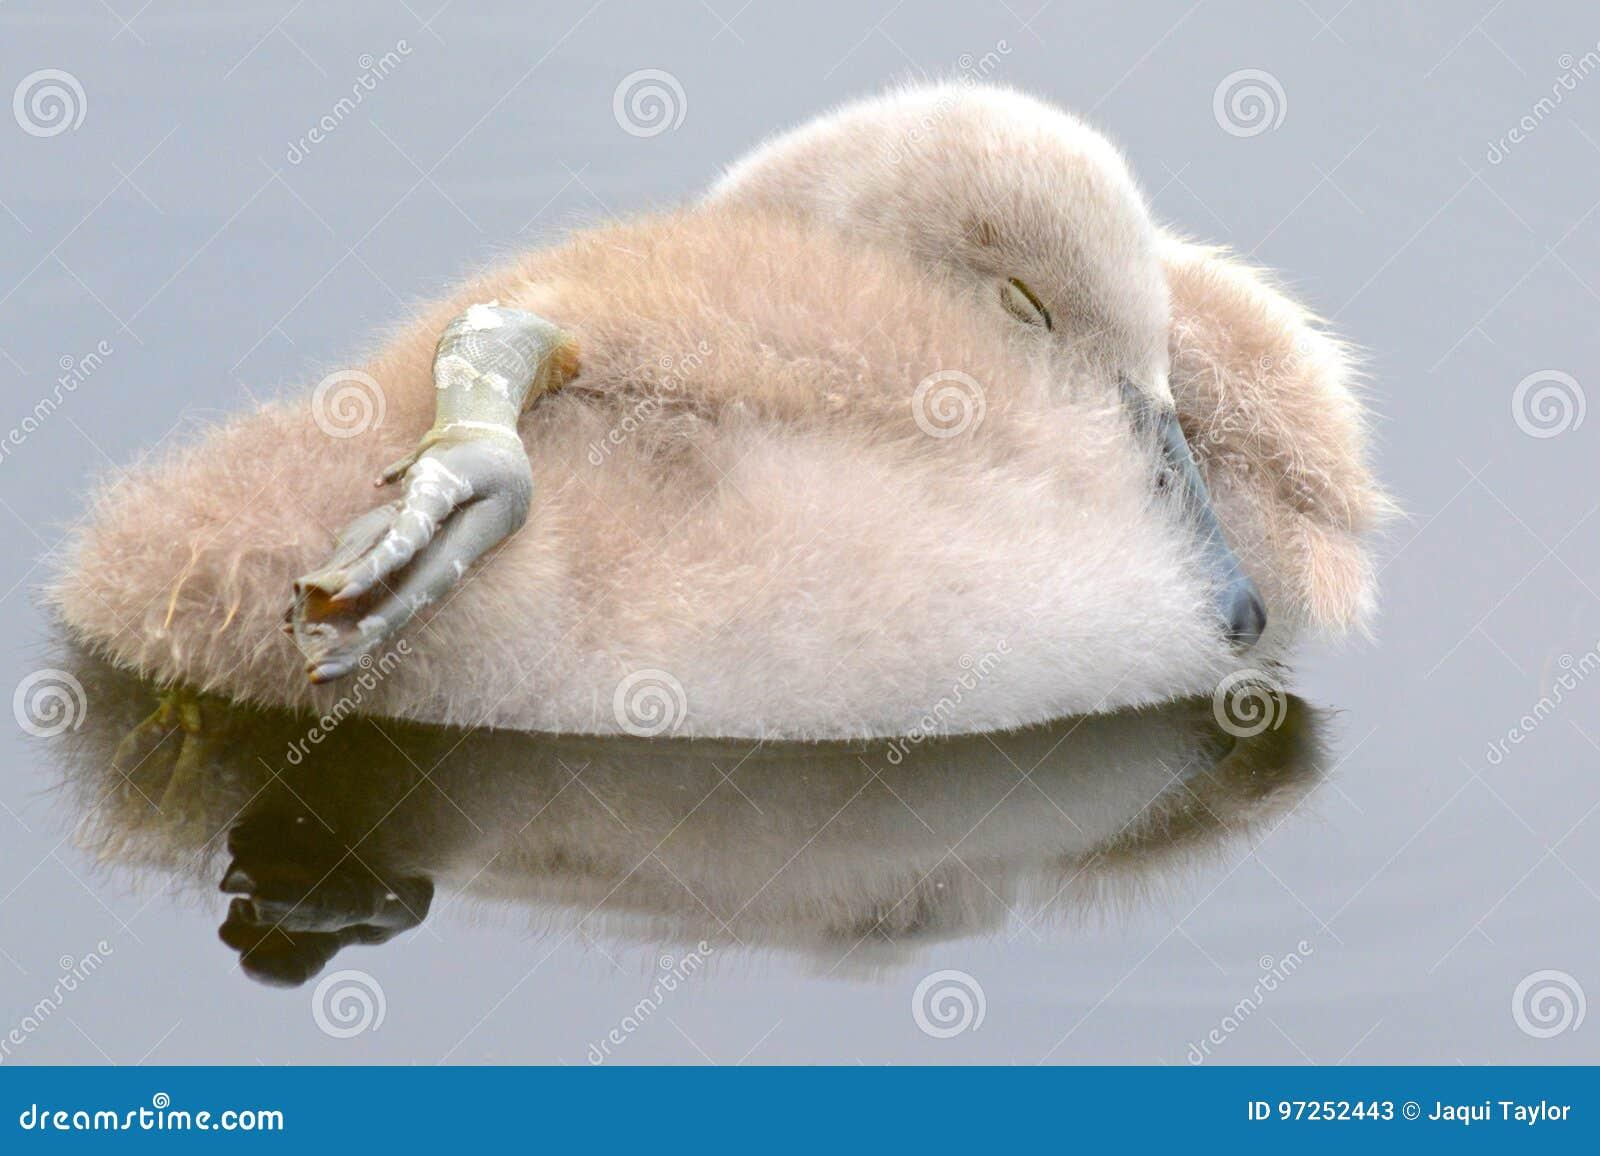 A cygnet sleeping on the water